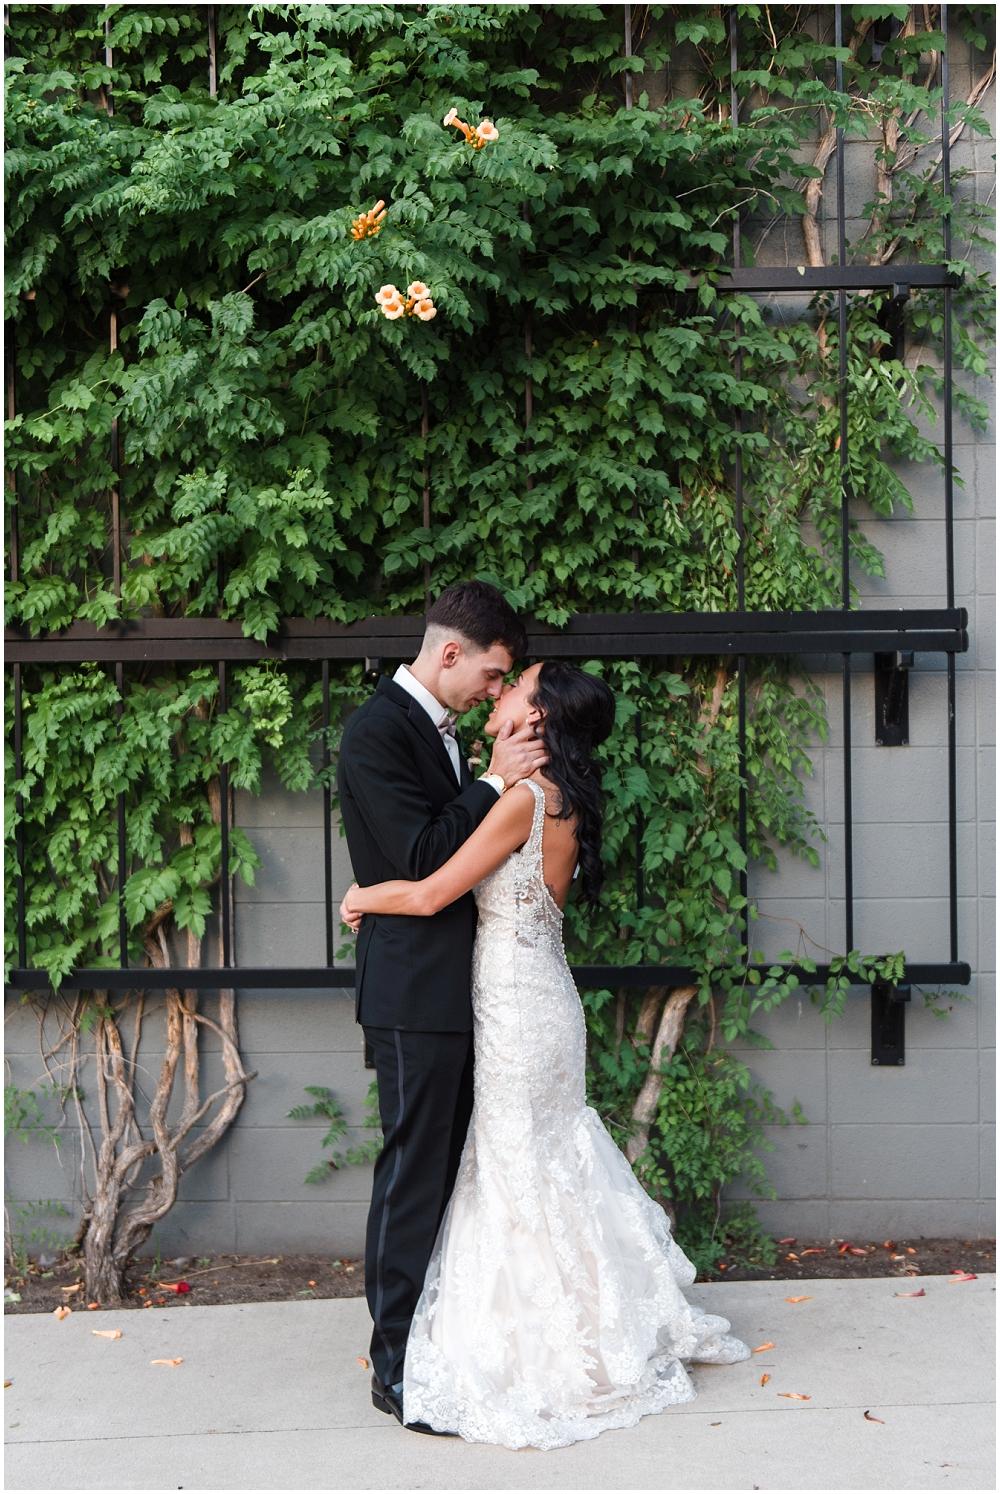 cat-alkire-wedding-photographer-indiana-chicago-indianapolis-fort-wayne_0162.jpg